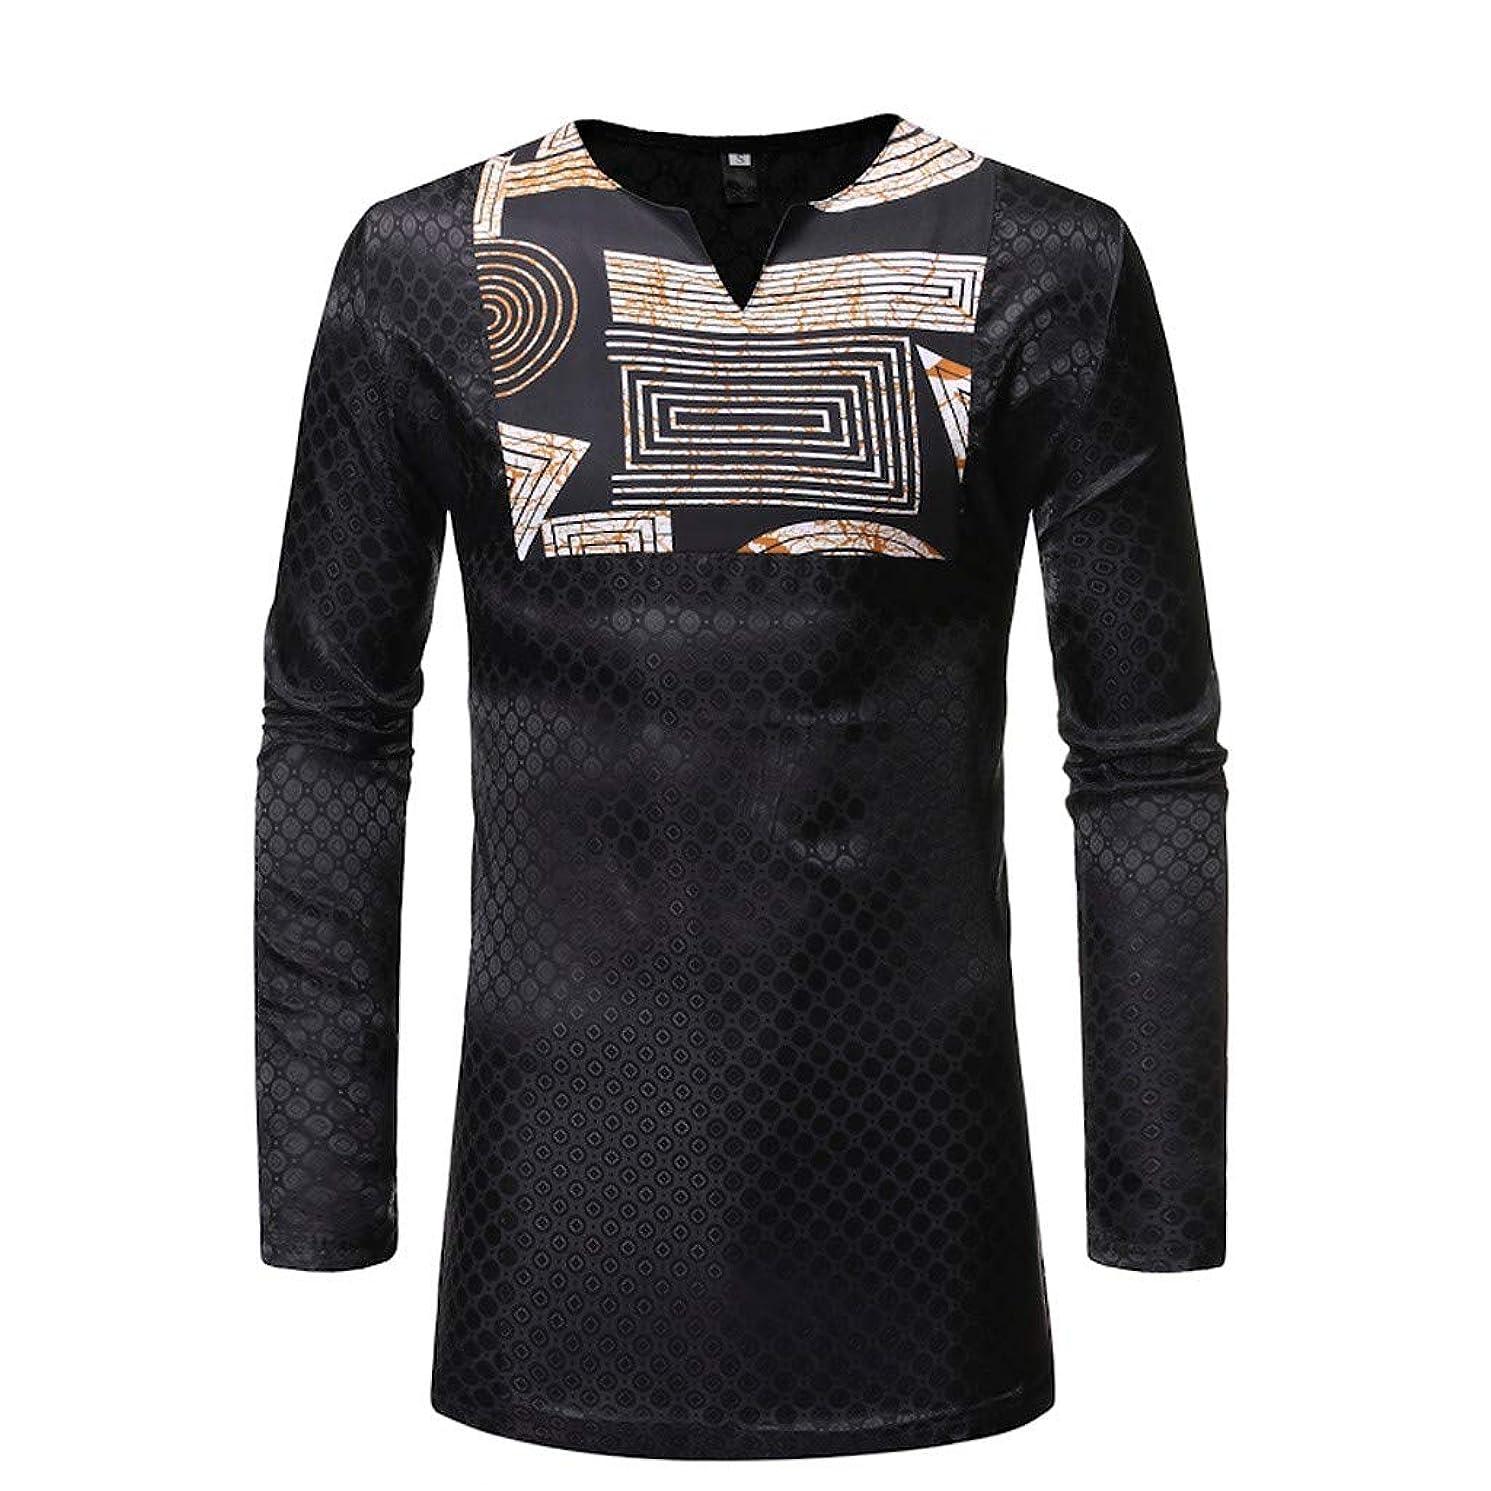 nightfall Mens African Clothing Tribal Printed Long Henley Shirt Traditional Ethnic